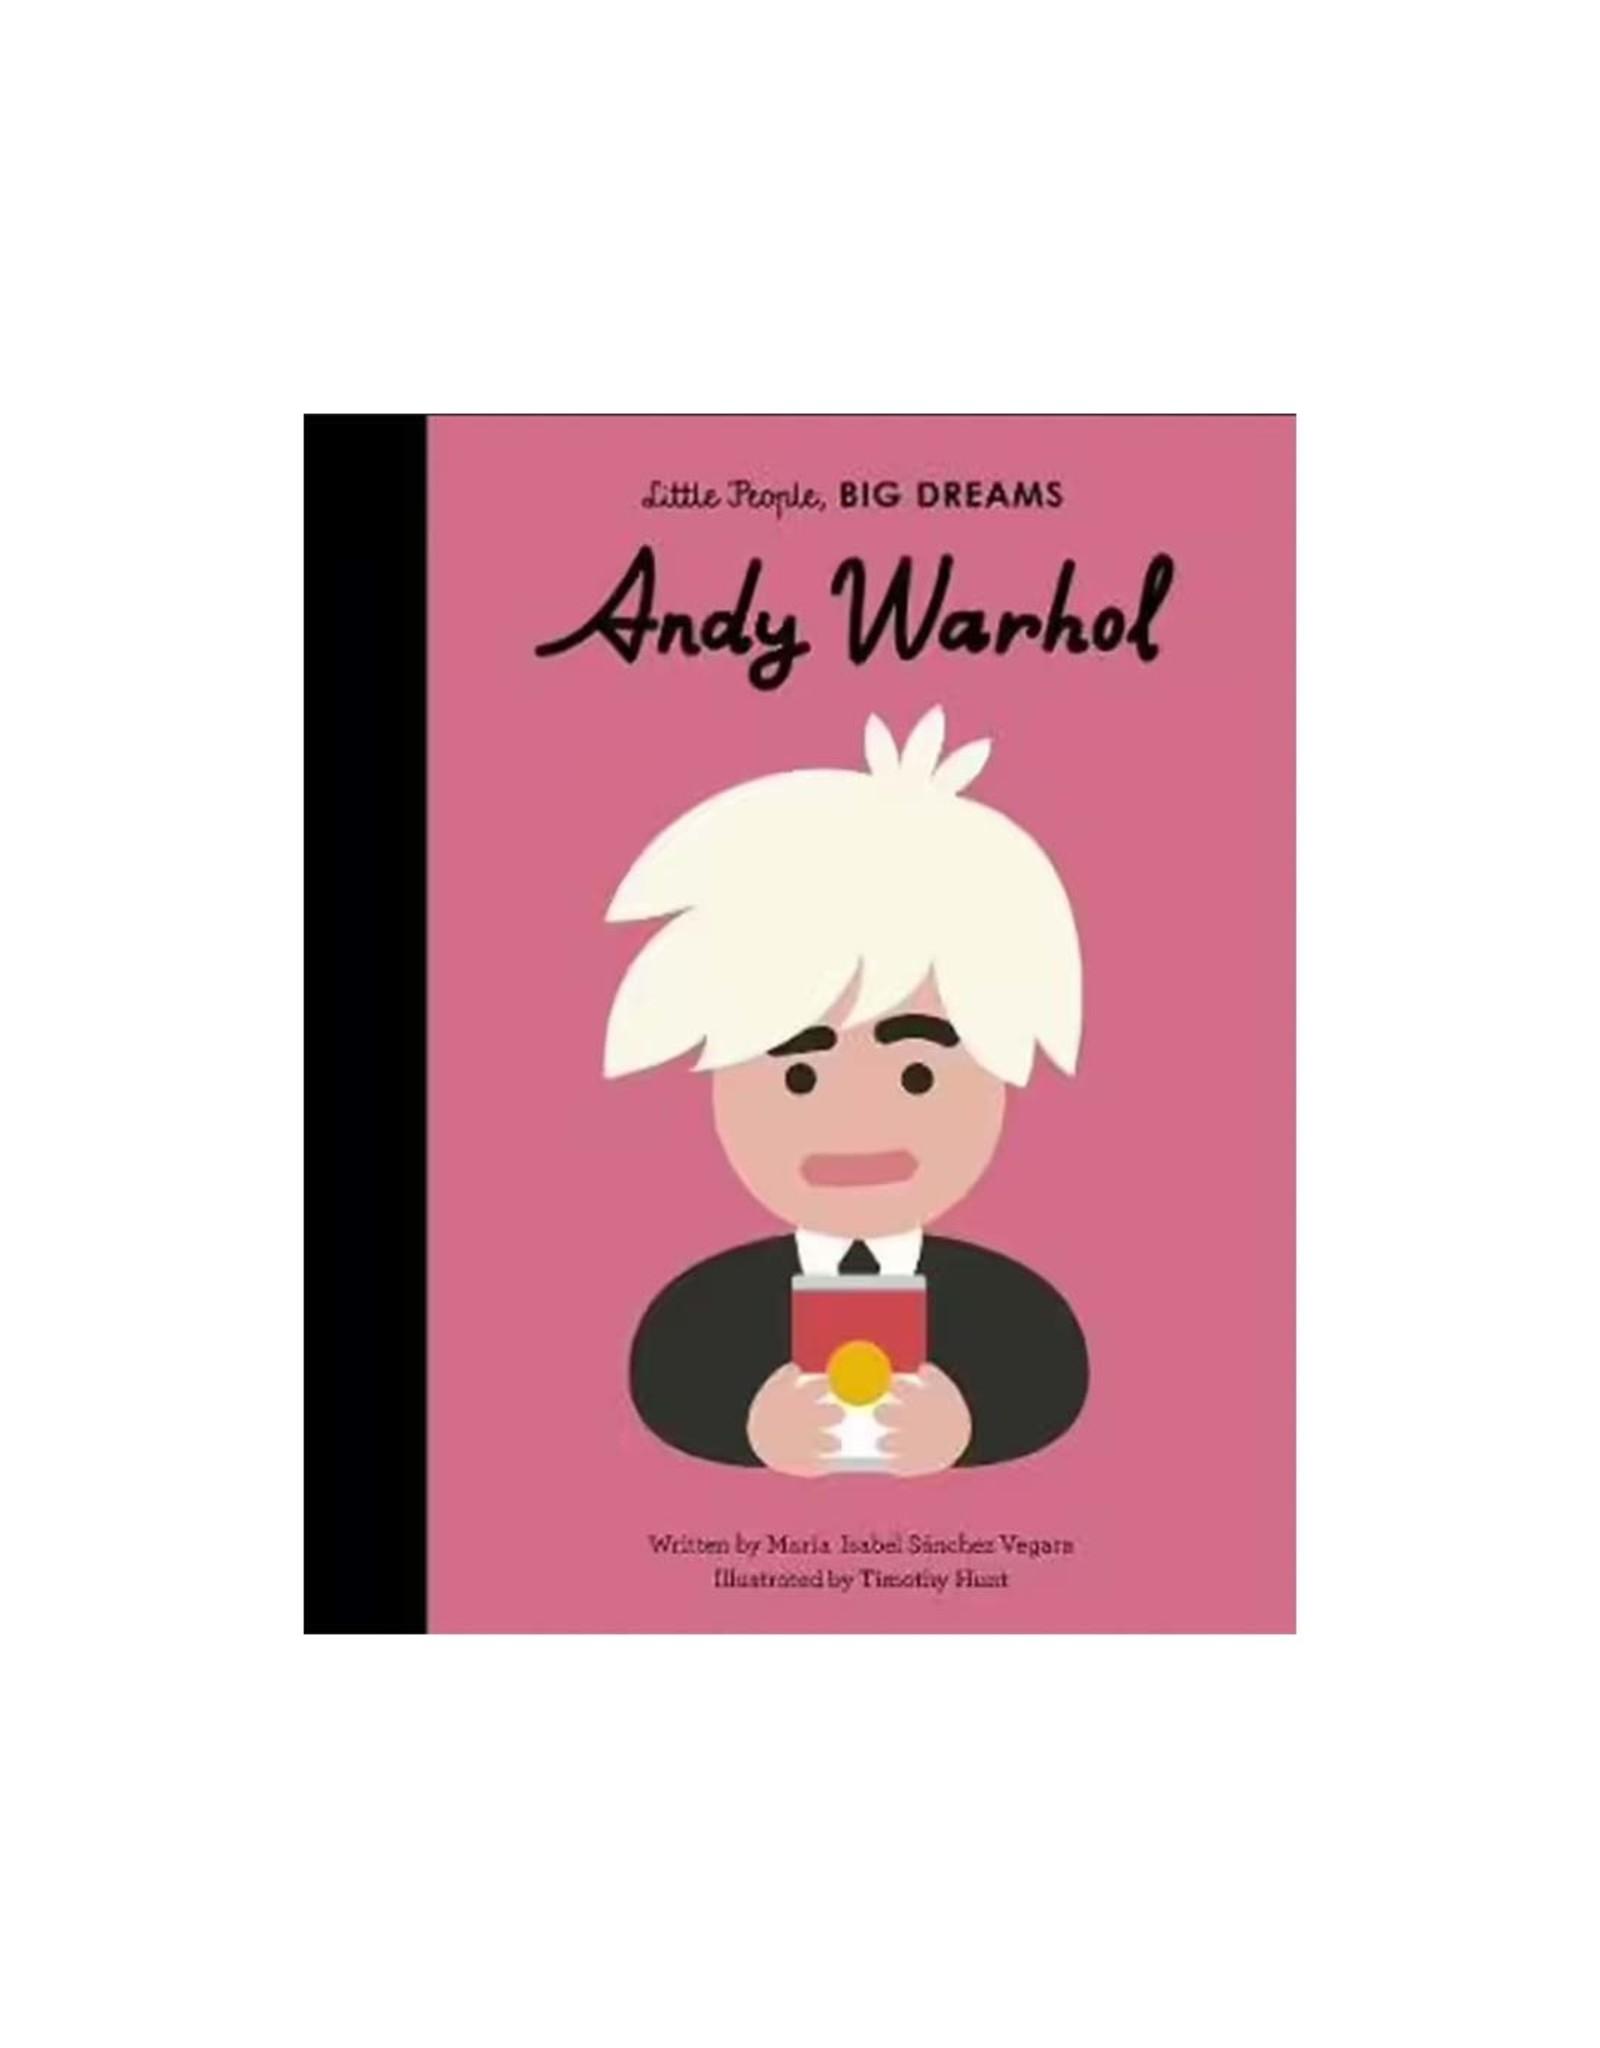 Little People Big Dreams, Andy Warhol